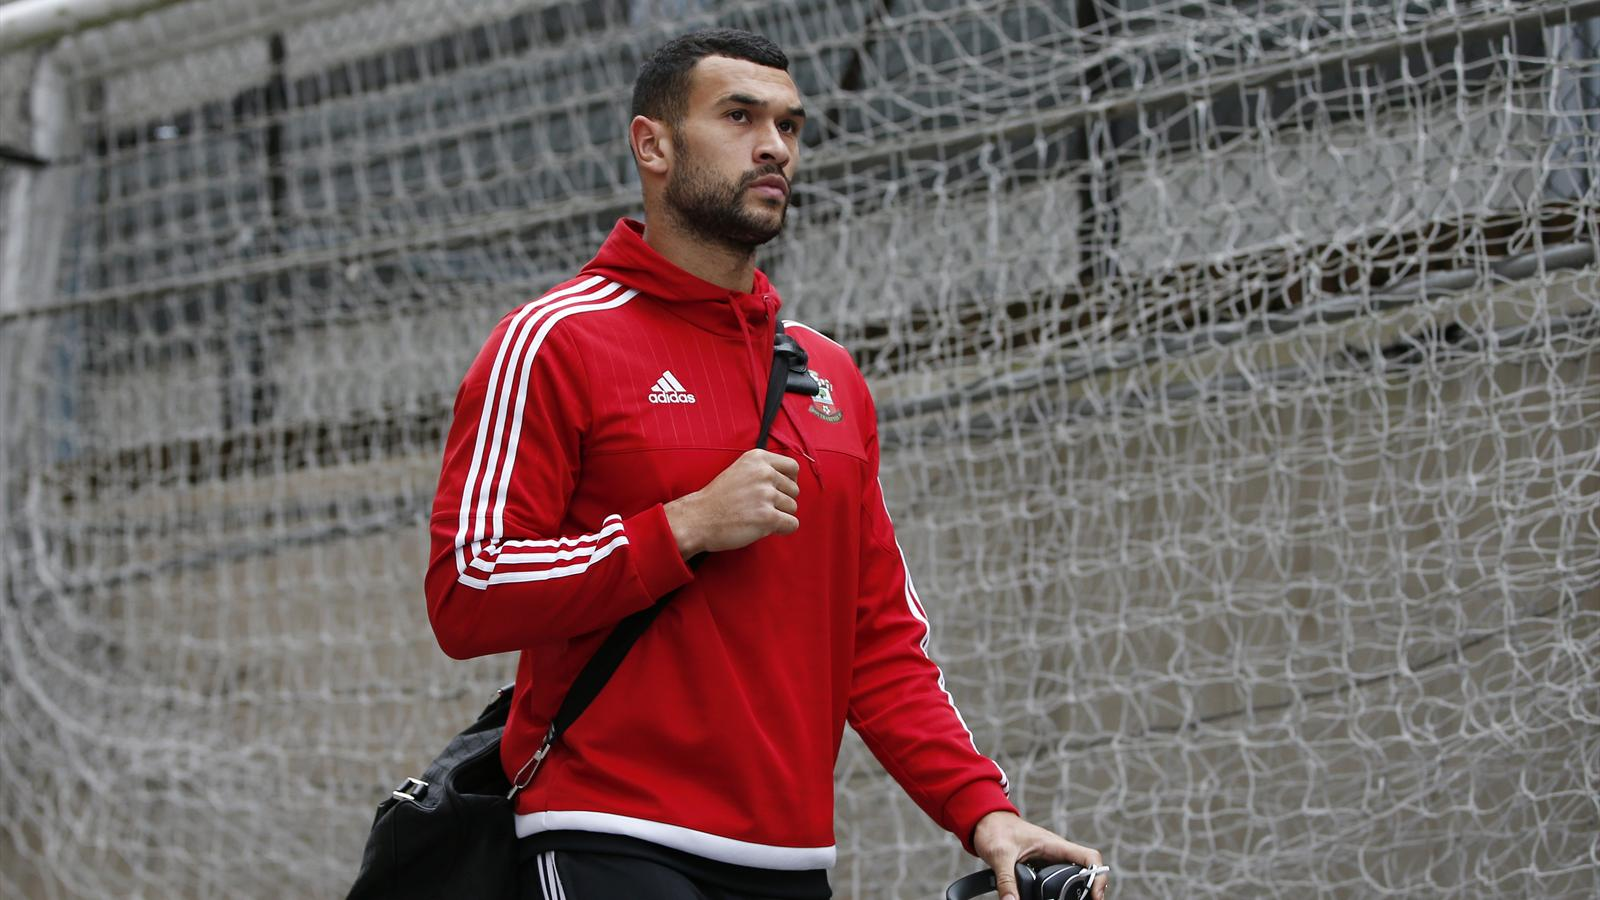 Southampton's Steven Caulker arrives before the match